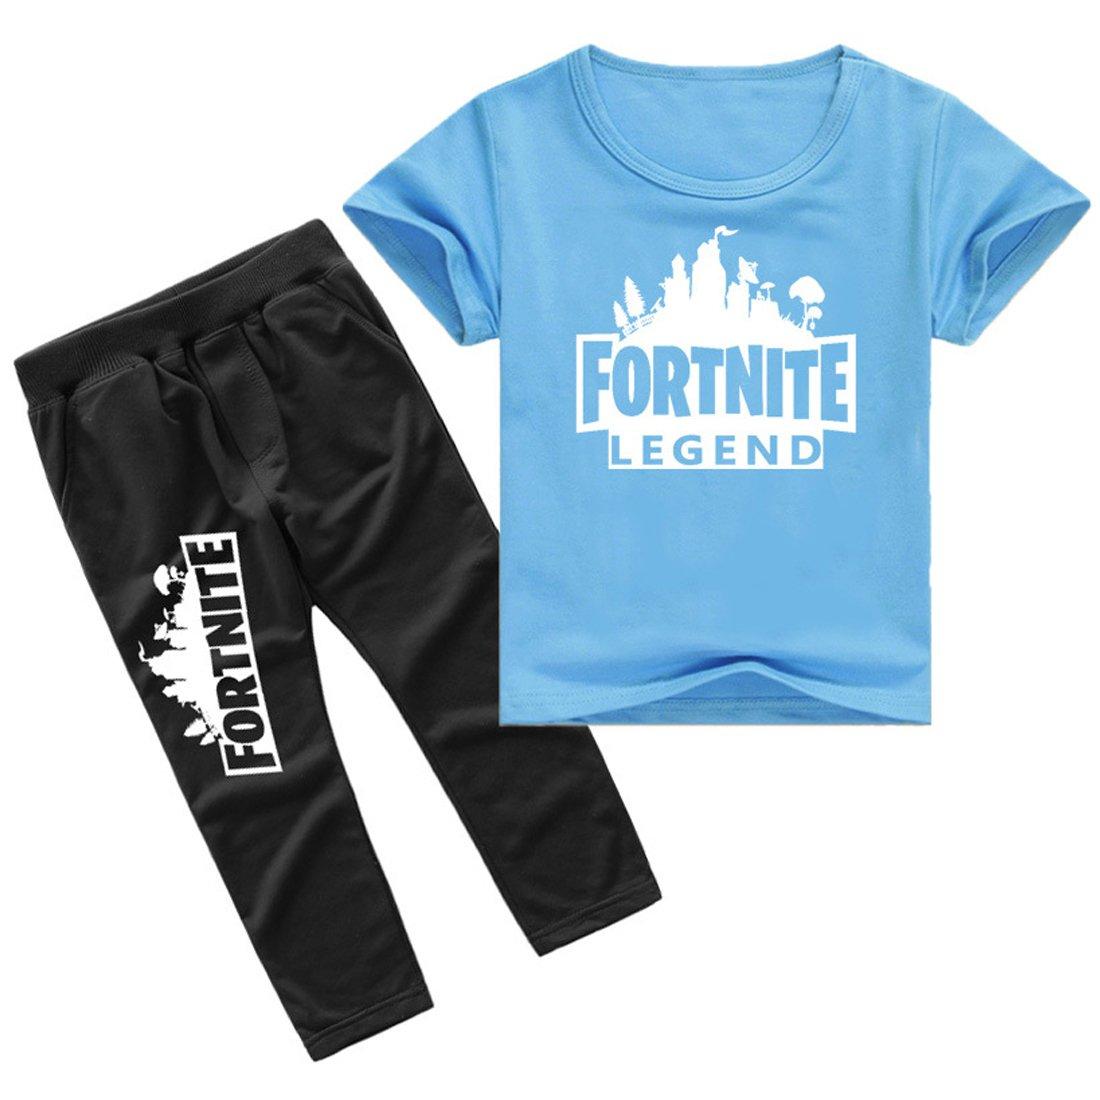 EMILYLE Unisex Fnite Conjunto De Camiseta Y Pantalones Casual Personajes Figura Impresa para Niños.